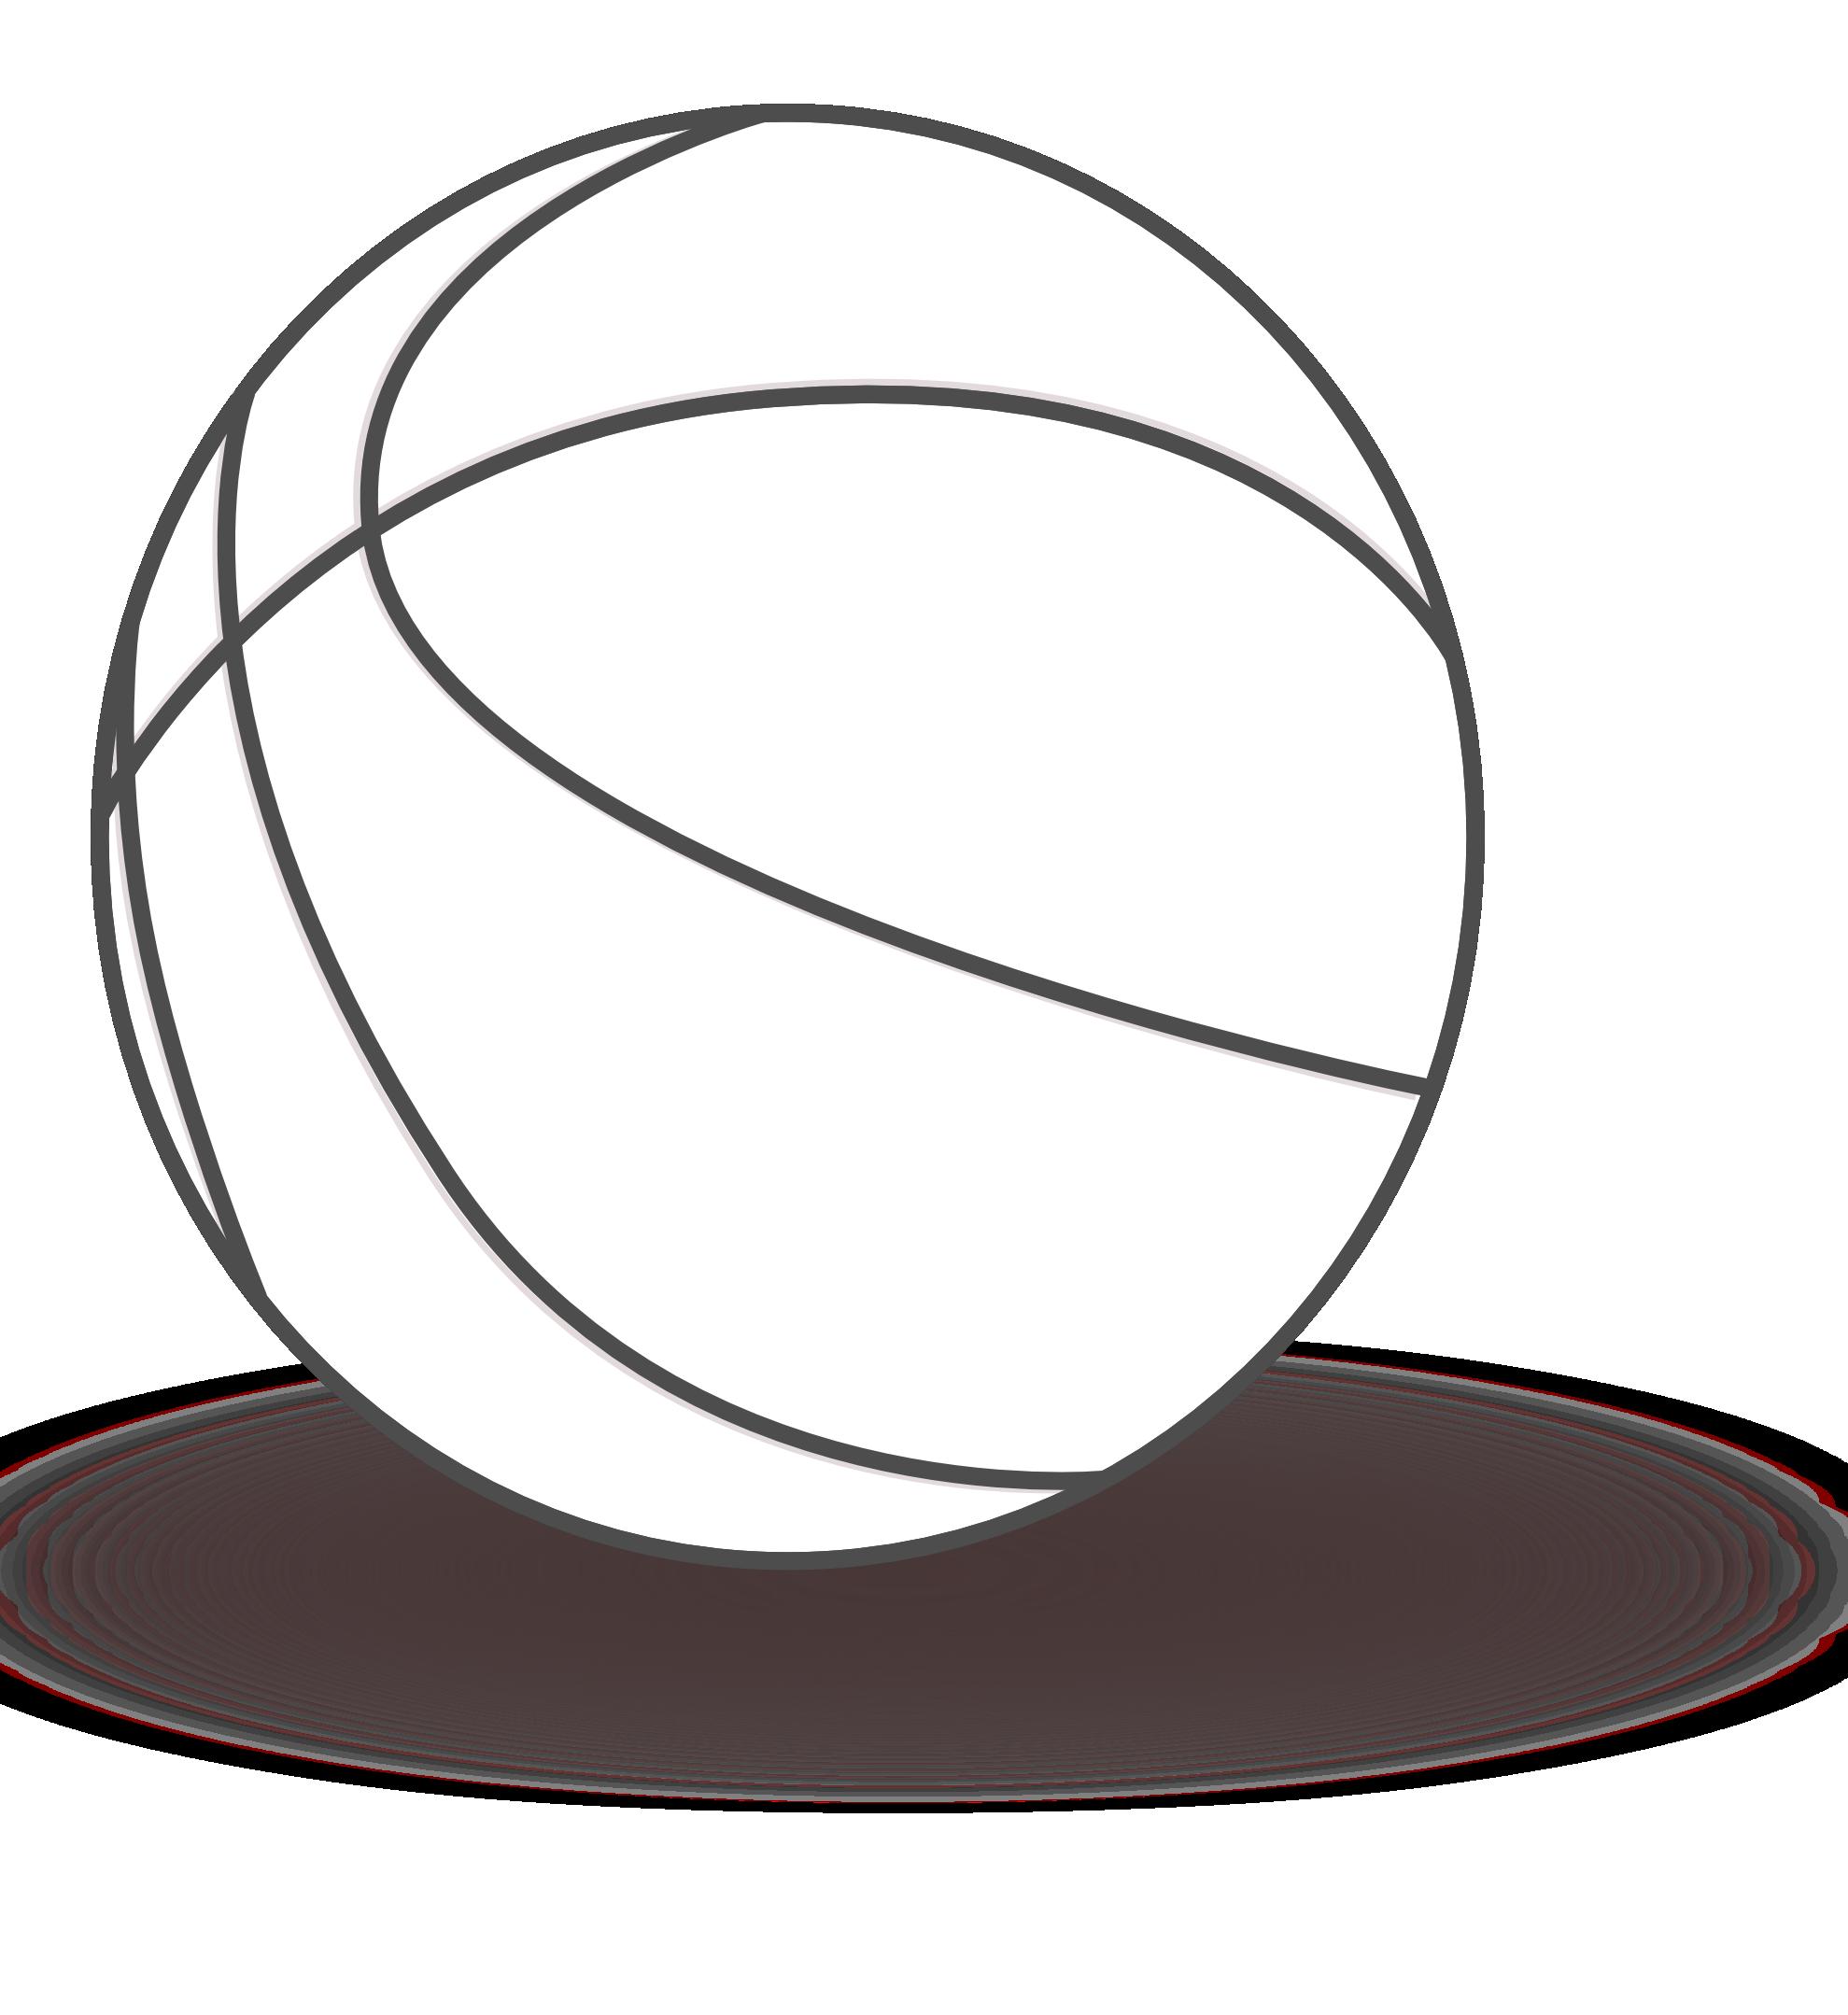 basketball-hoop-clipart-black-and-white-basketball_black_white_line ...